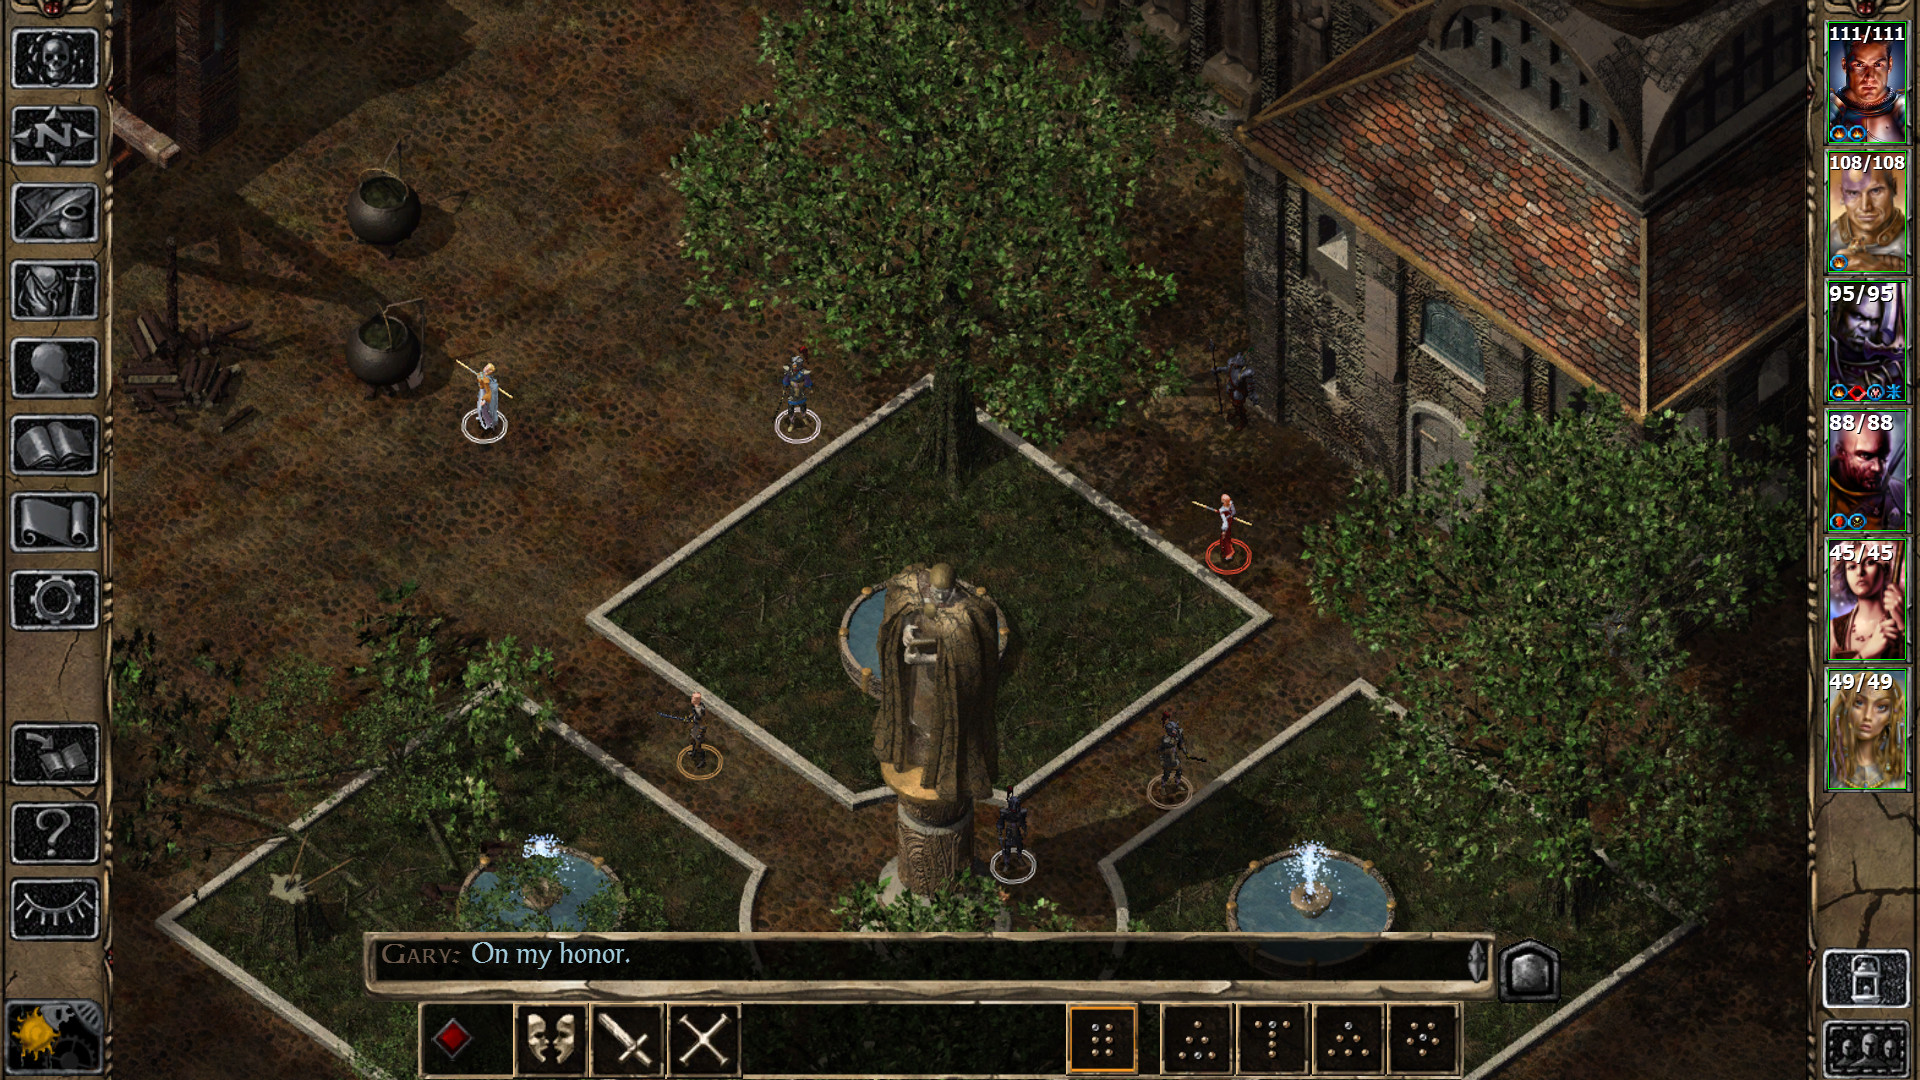 Download Baldur S Gate Ii Enhanced Edition Full Pc Game